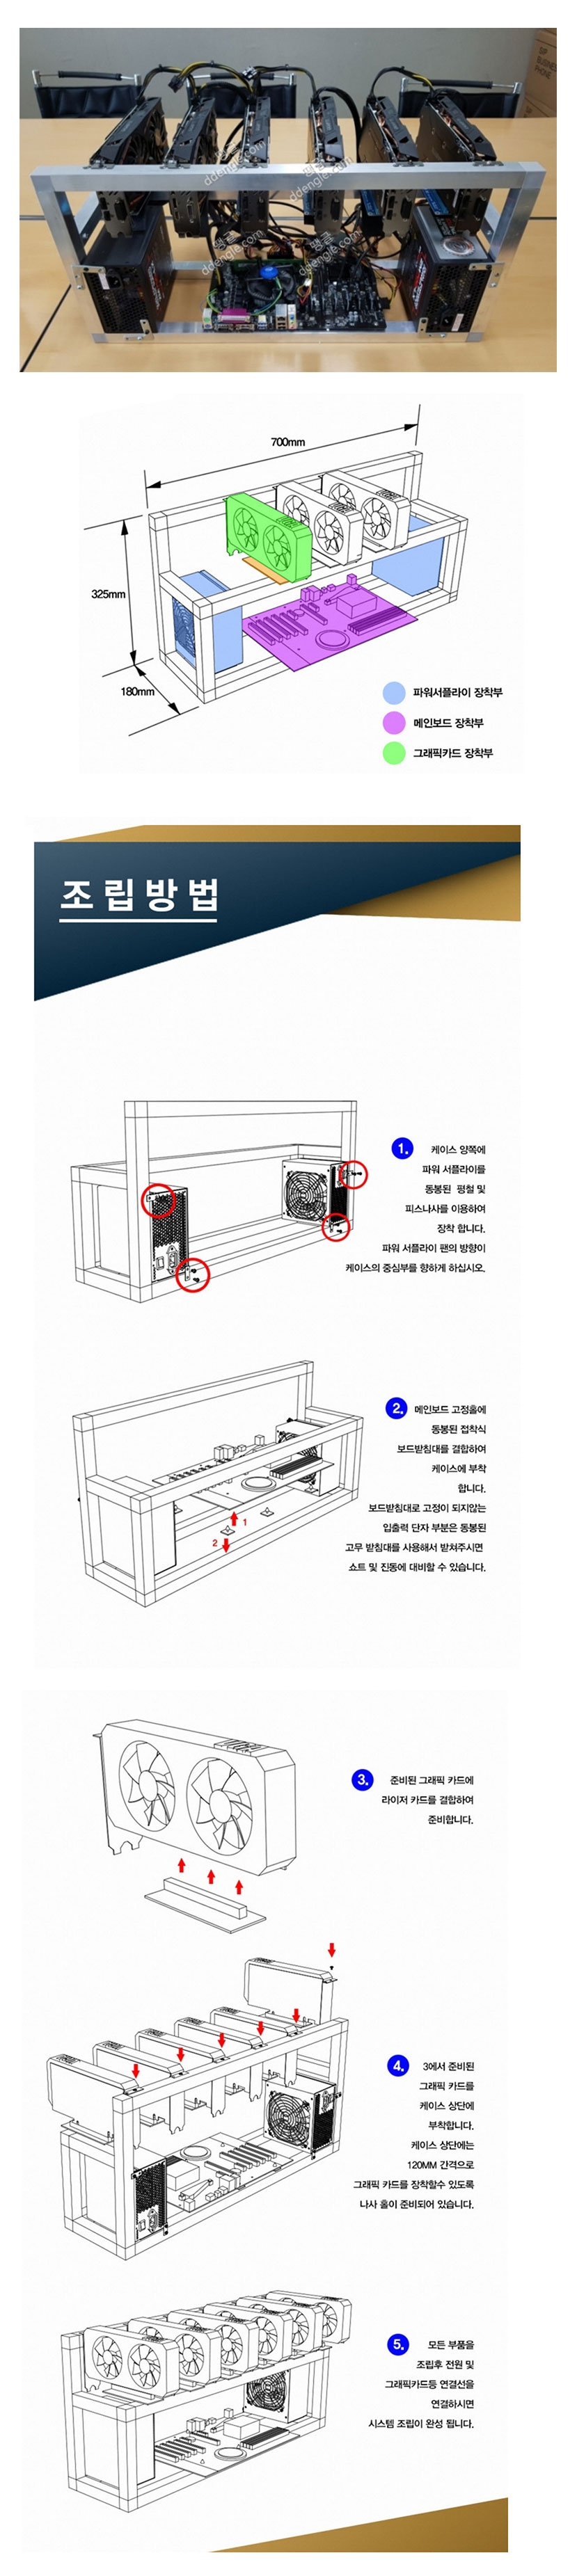 6way-stand.jpg